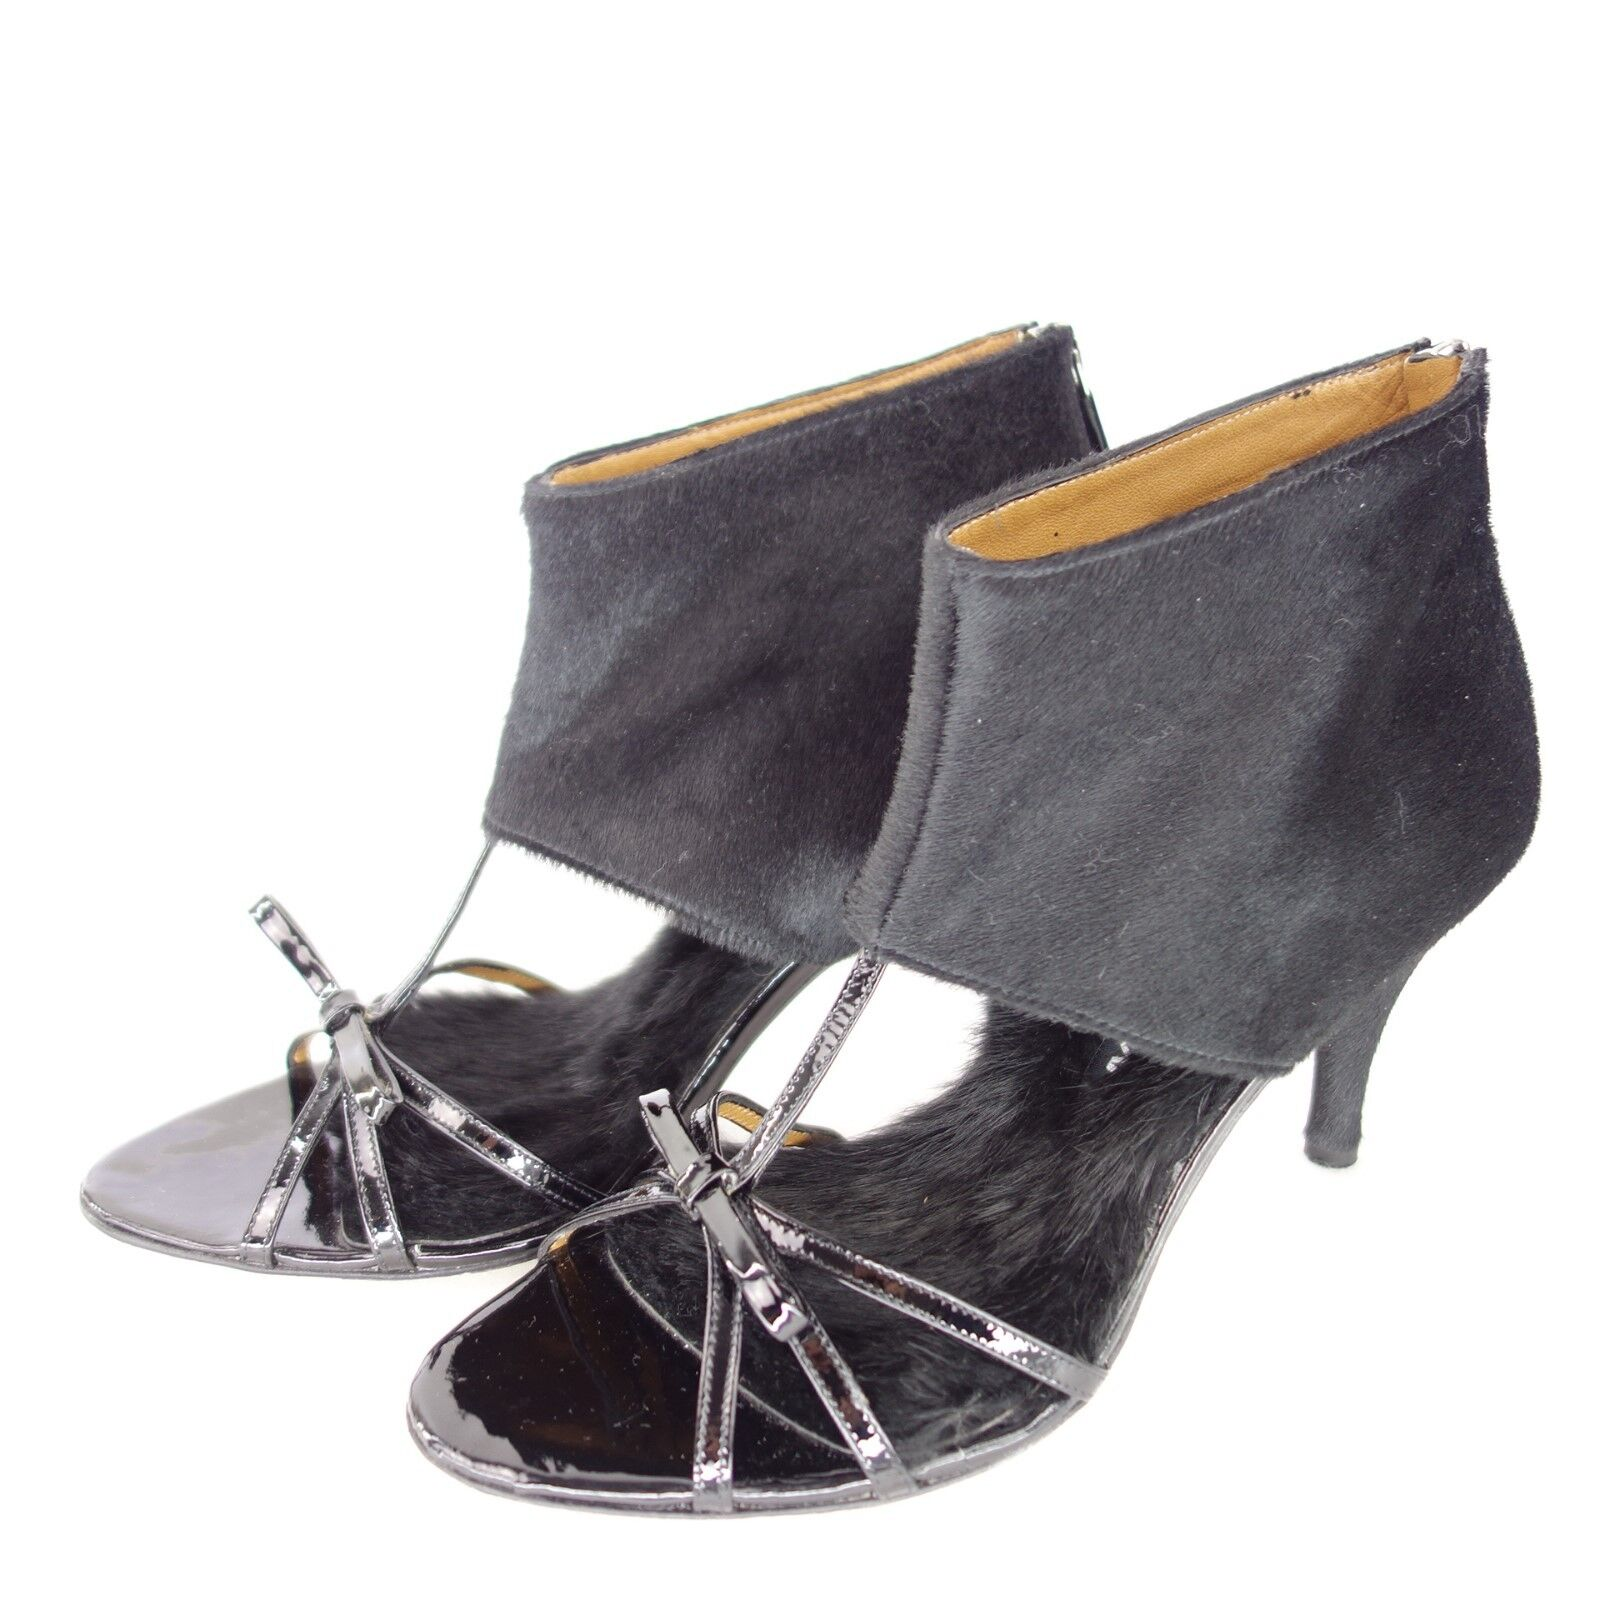 MUXART Lackleder Damen Sandaletten Schuhe MARTA Schwarz Leder Lackleder MUXART Fell NP 289 NEU efe98a